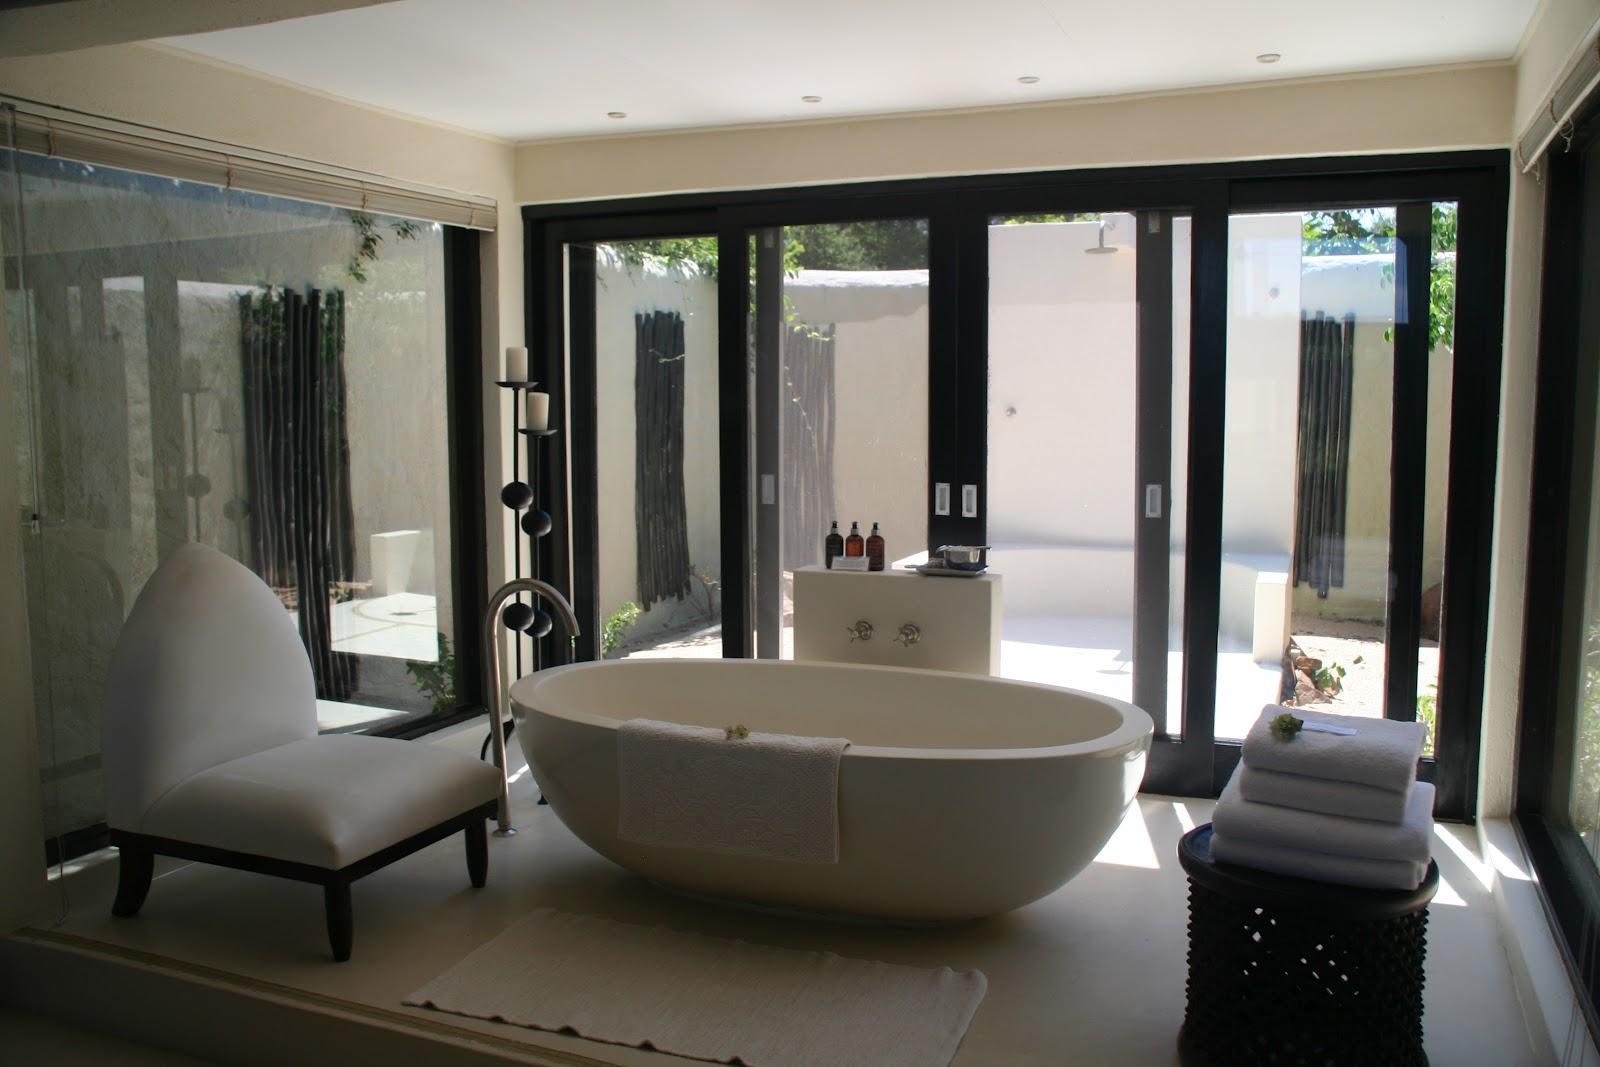 Brocante charmante moderne bad und raumgestaltung for Raumgestaltung bad